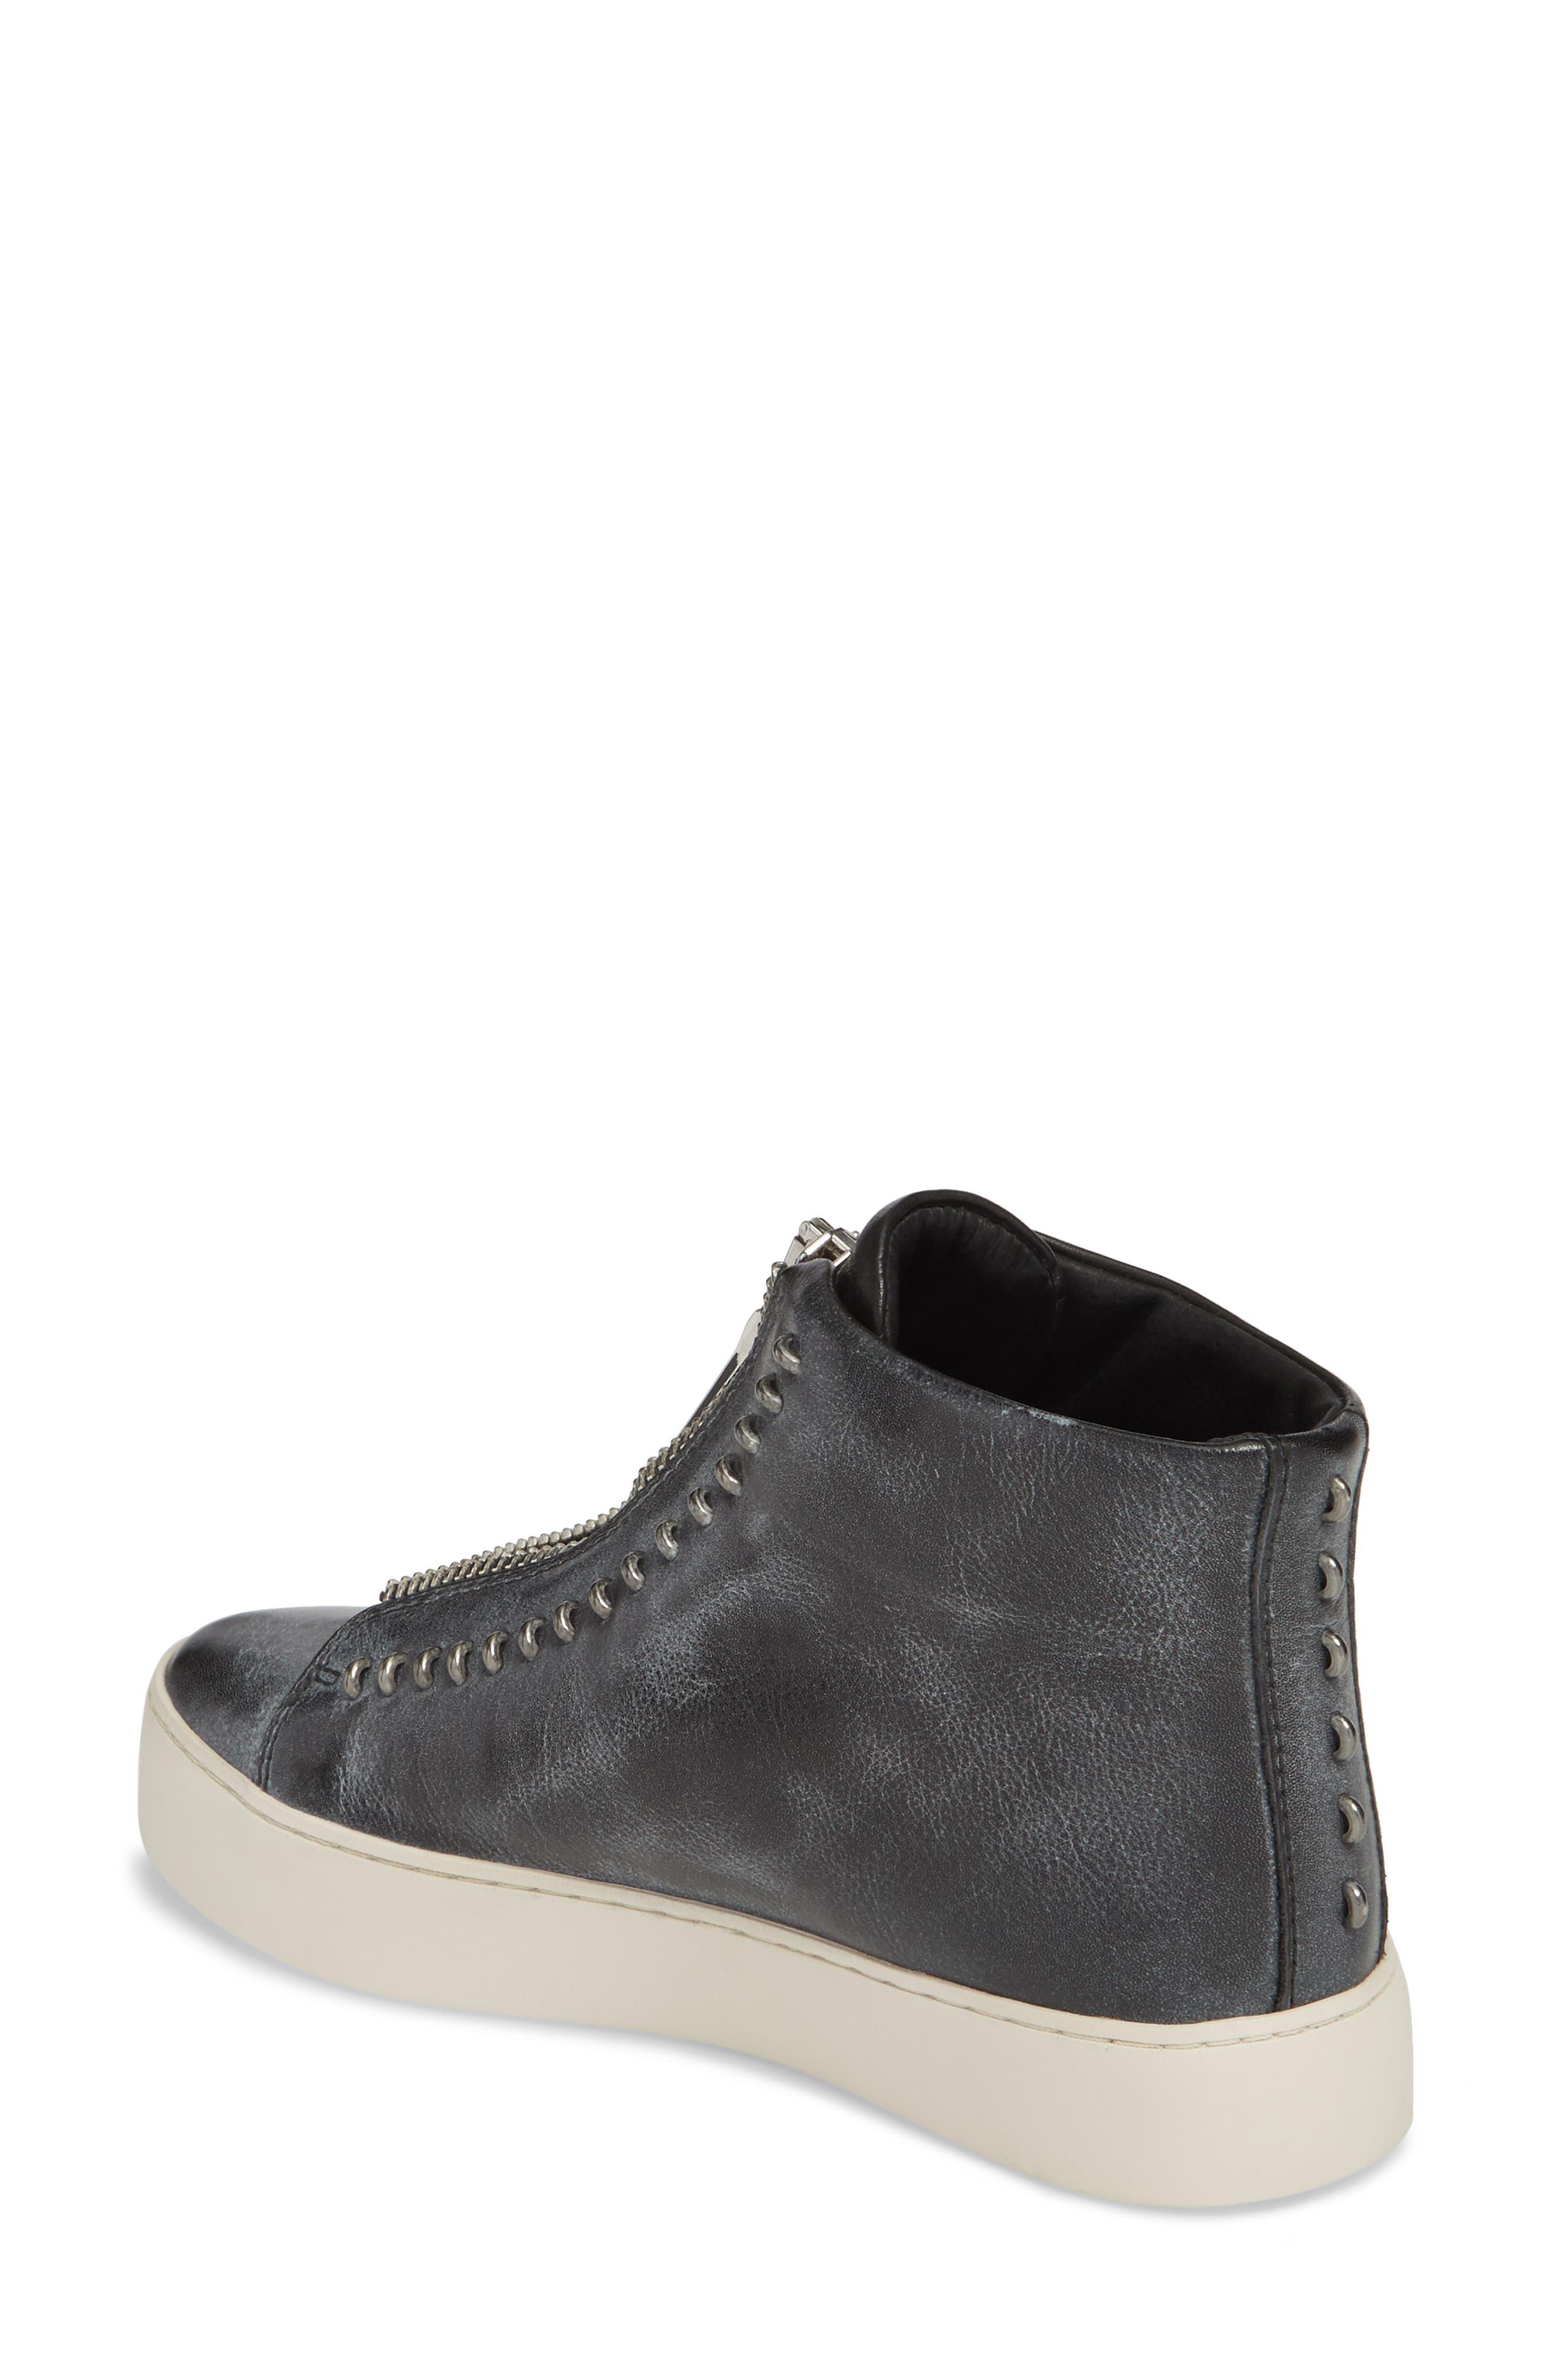 Alternate Image 2  - Frye Lena Rebel Zip High Top Sneaker (Women)